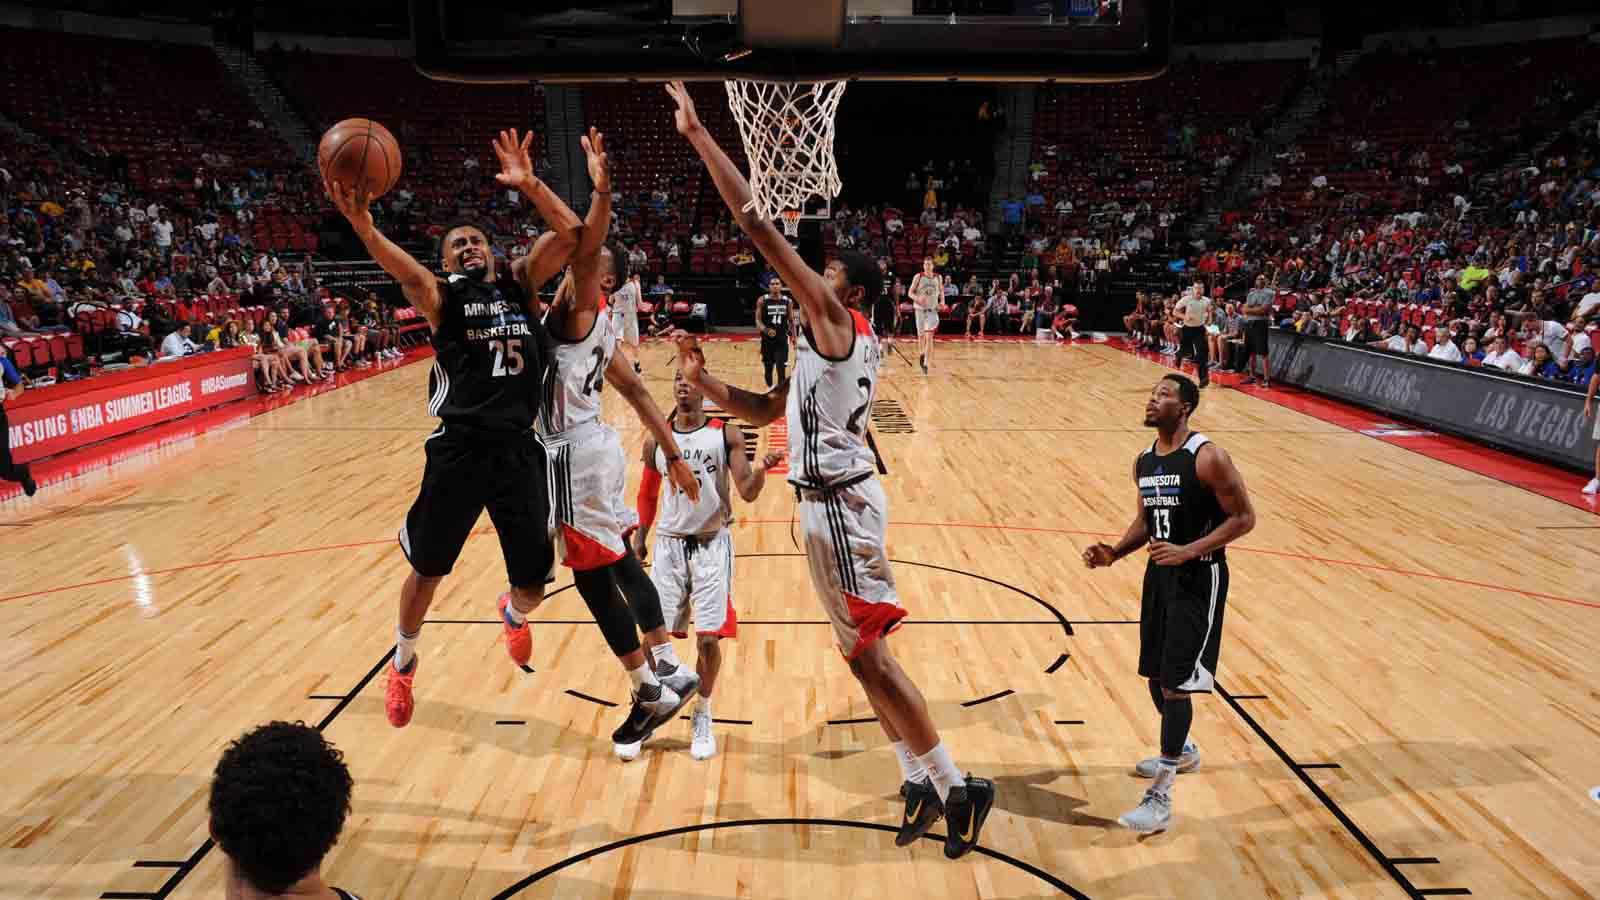 NBA Summer League recap: Timberwolves 81, Raptors 79